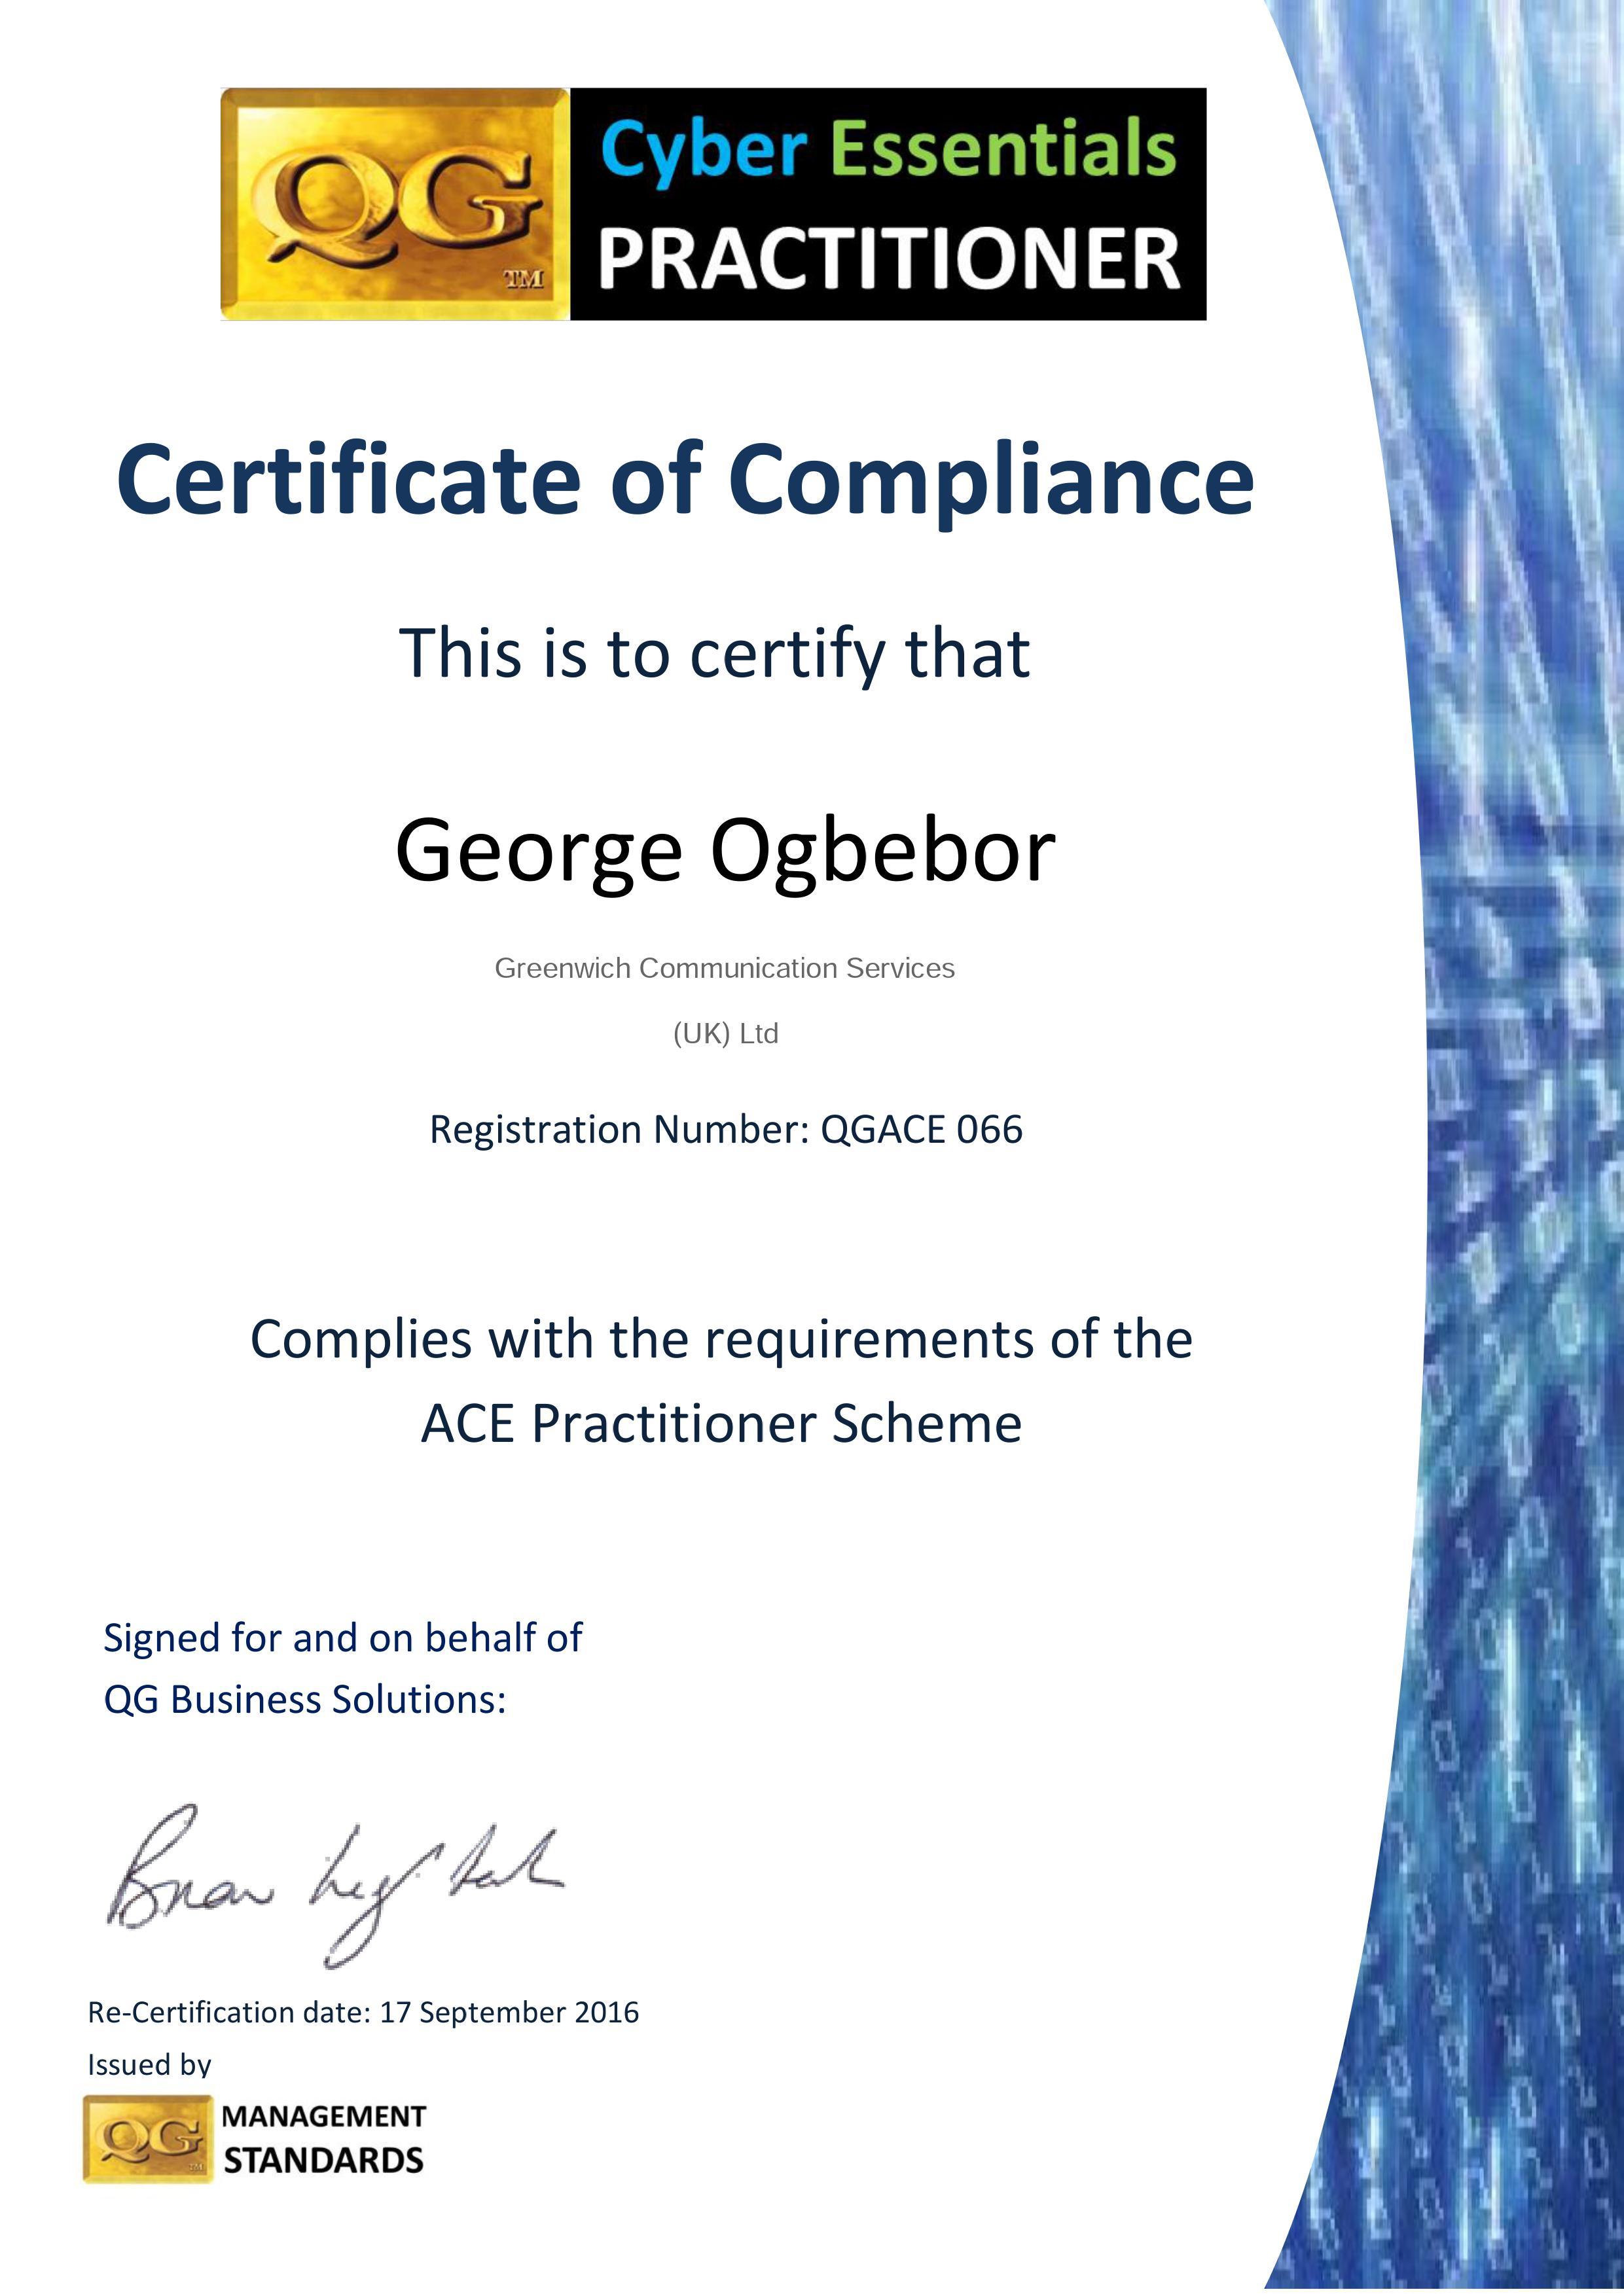 QGACE066 15 16 cert George